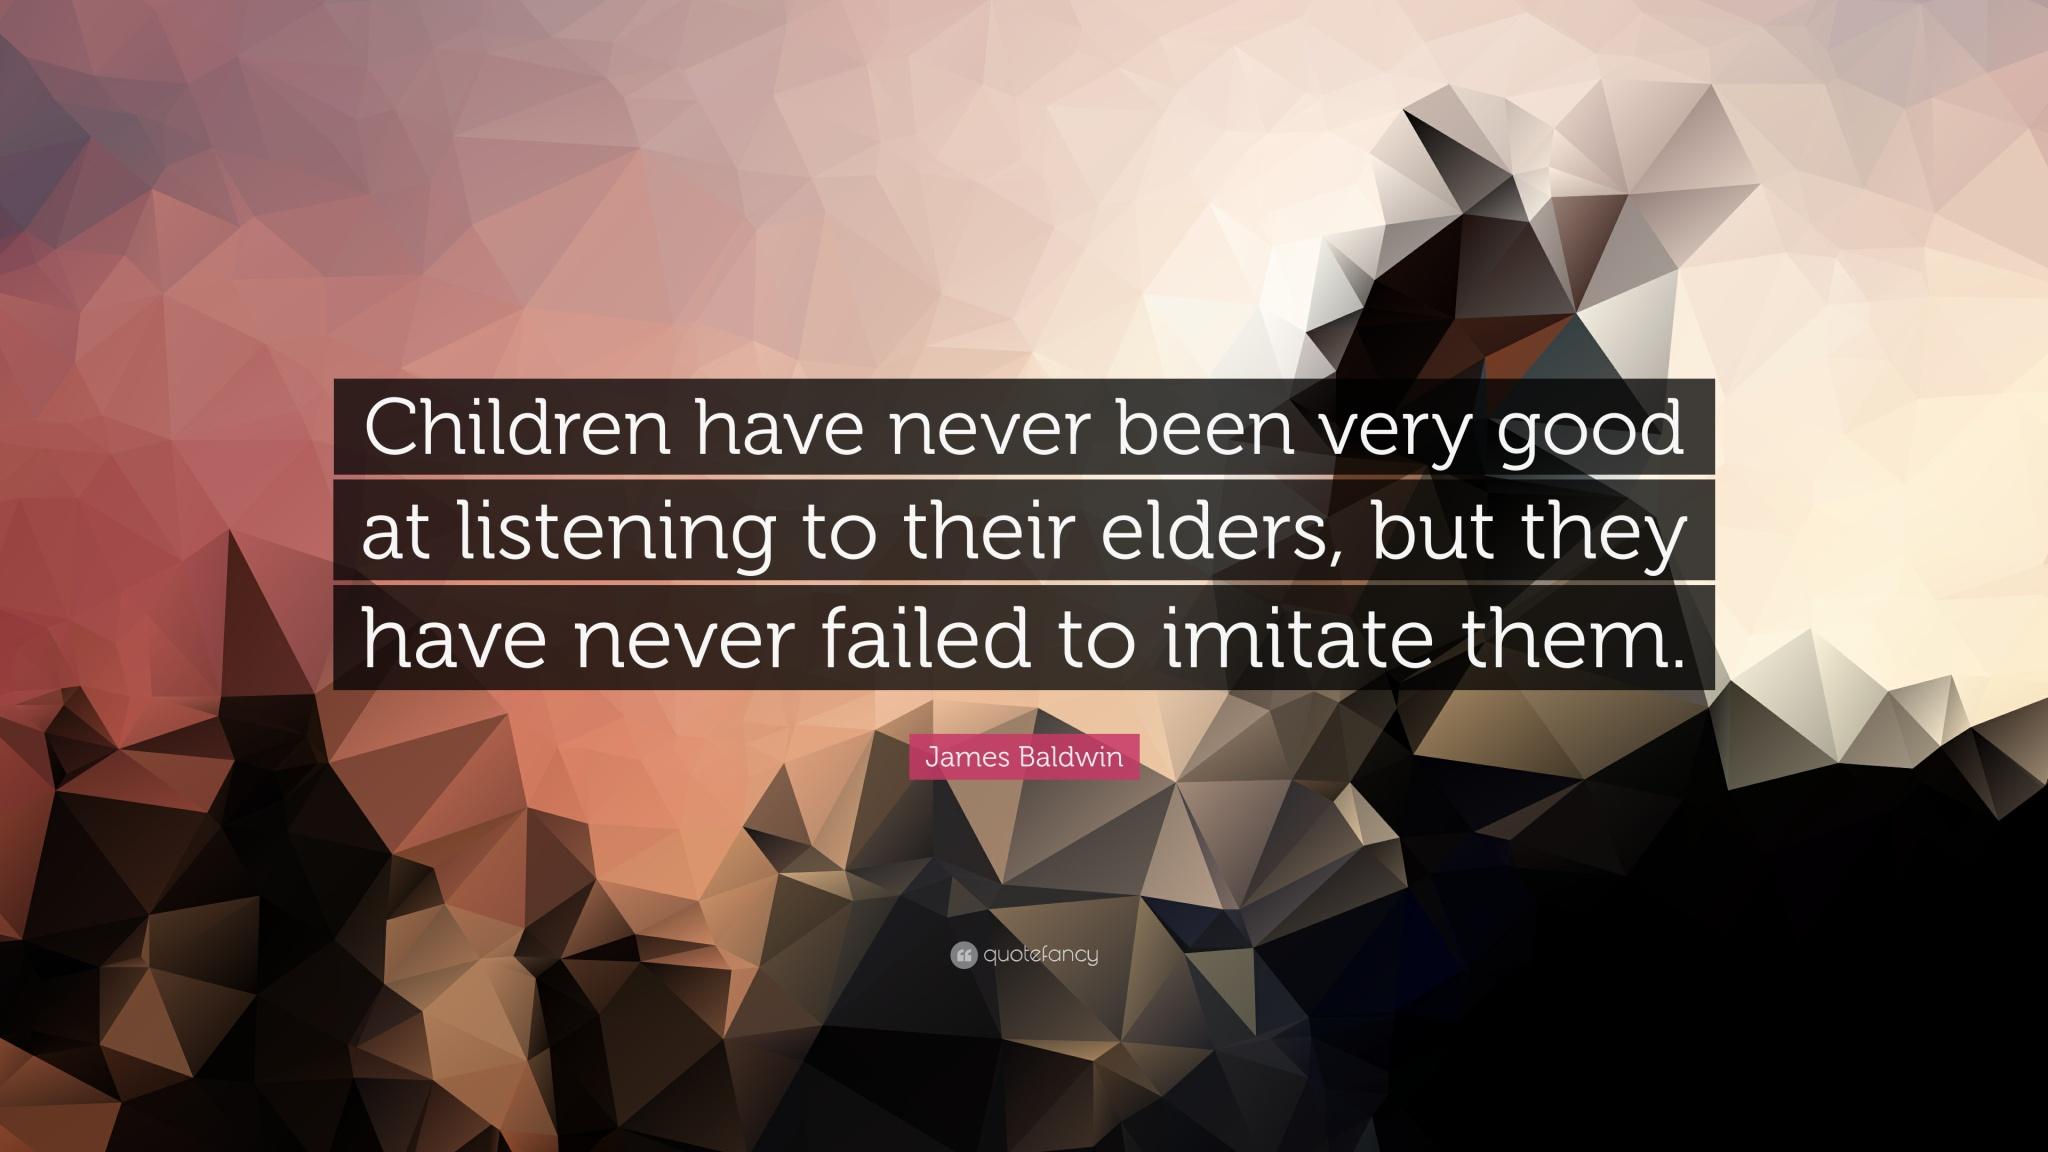 199218-James-Baldwin-Quote-Children-have-never-been-very-good-at